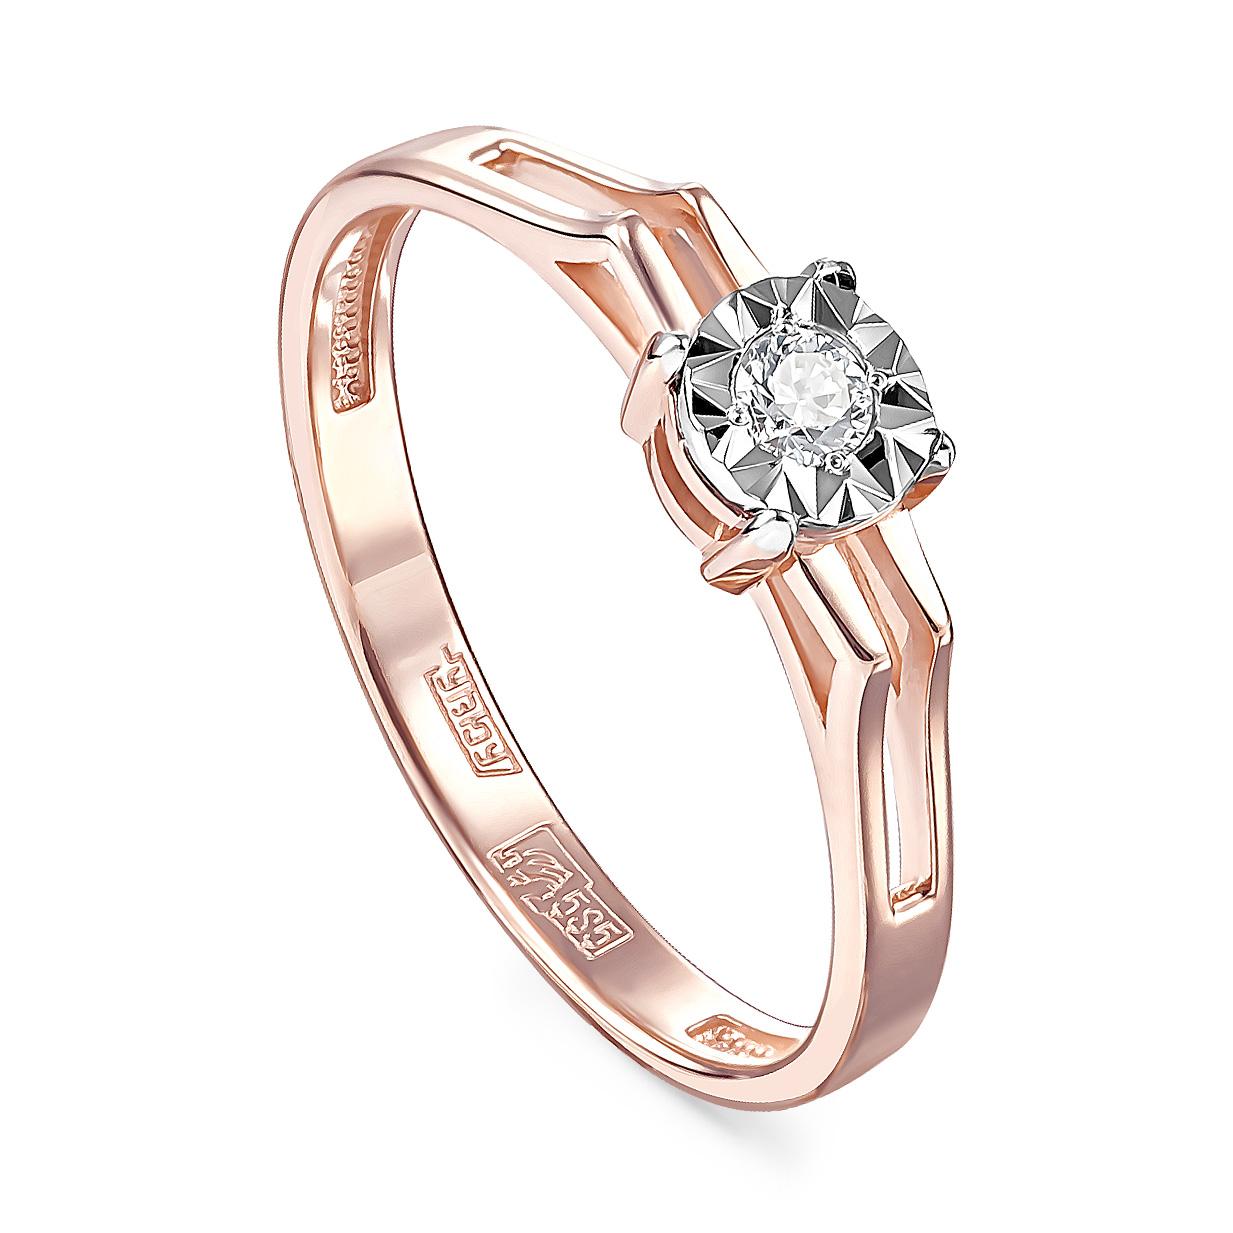 Золотое кольцо Бриллиант арт. 11-01111-1000 11-01111-1000